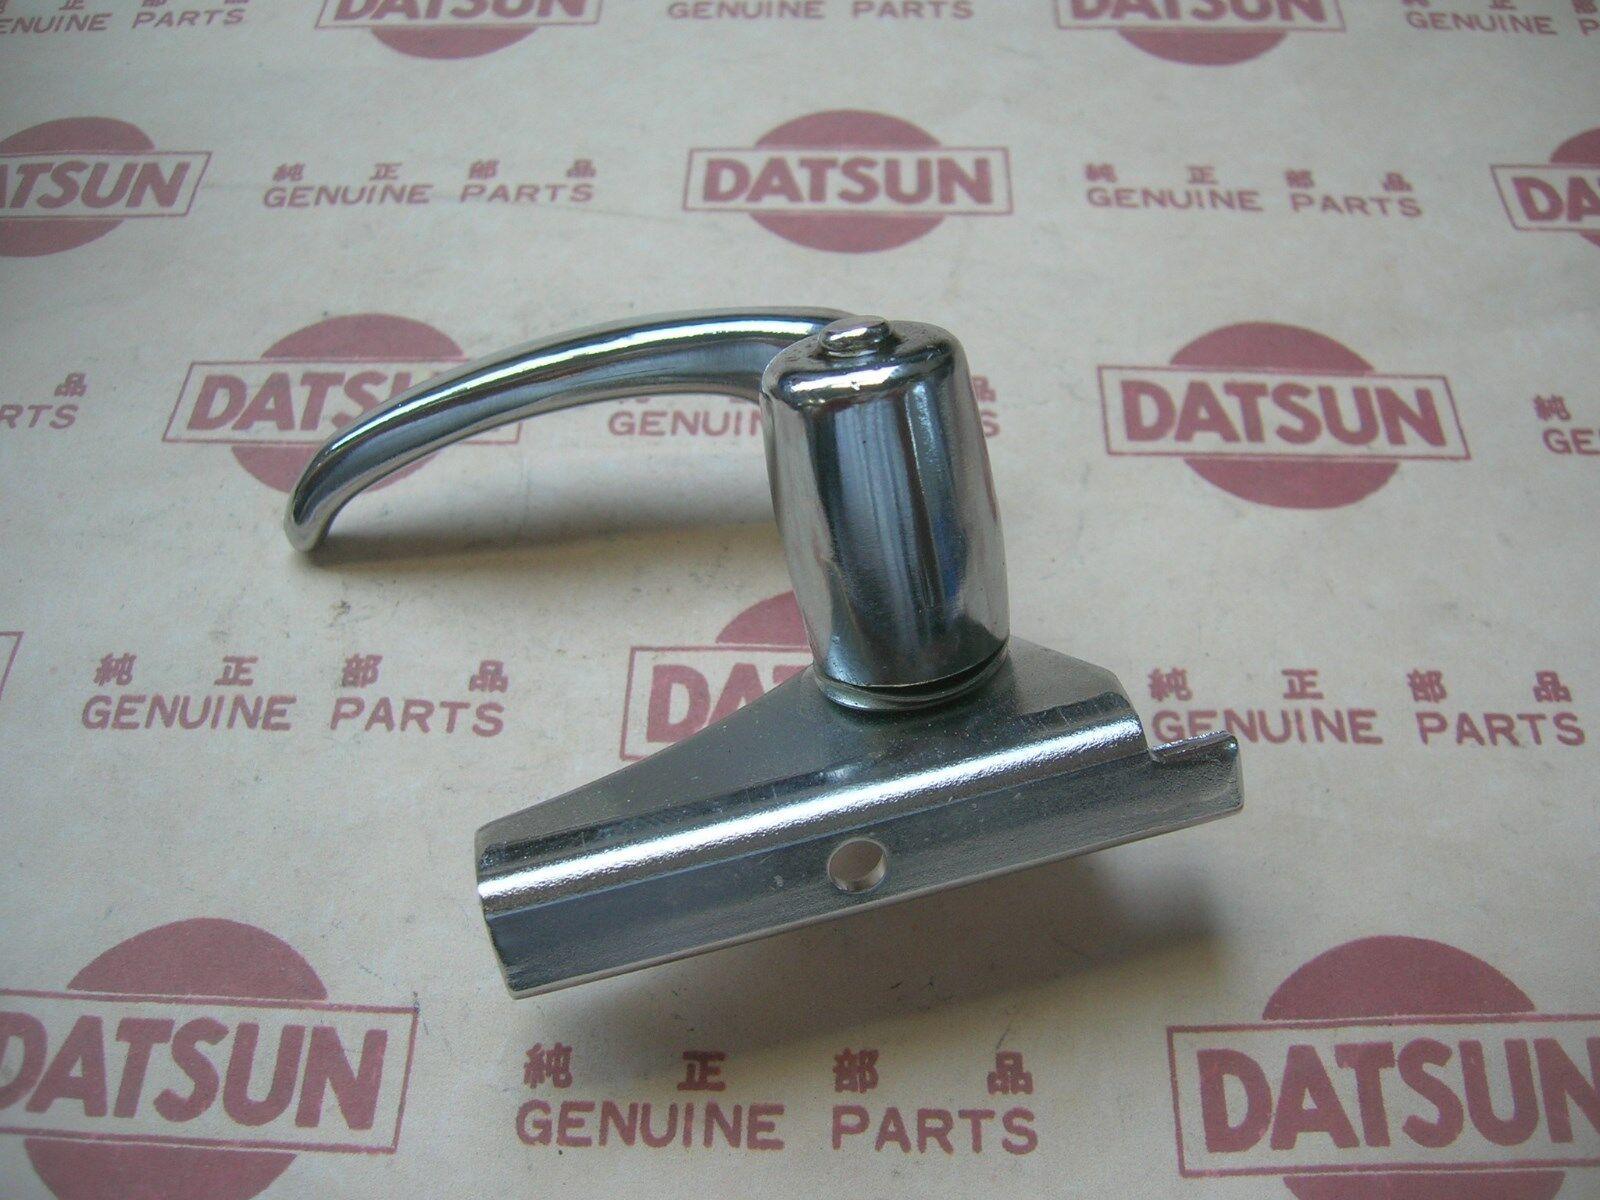 Chevrolet GM OEM 14-15 Cruze Engine Parts-Drain Plug Seal 55196309